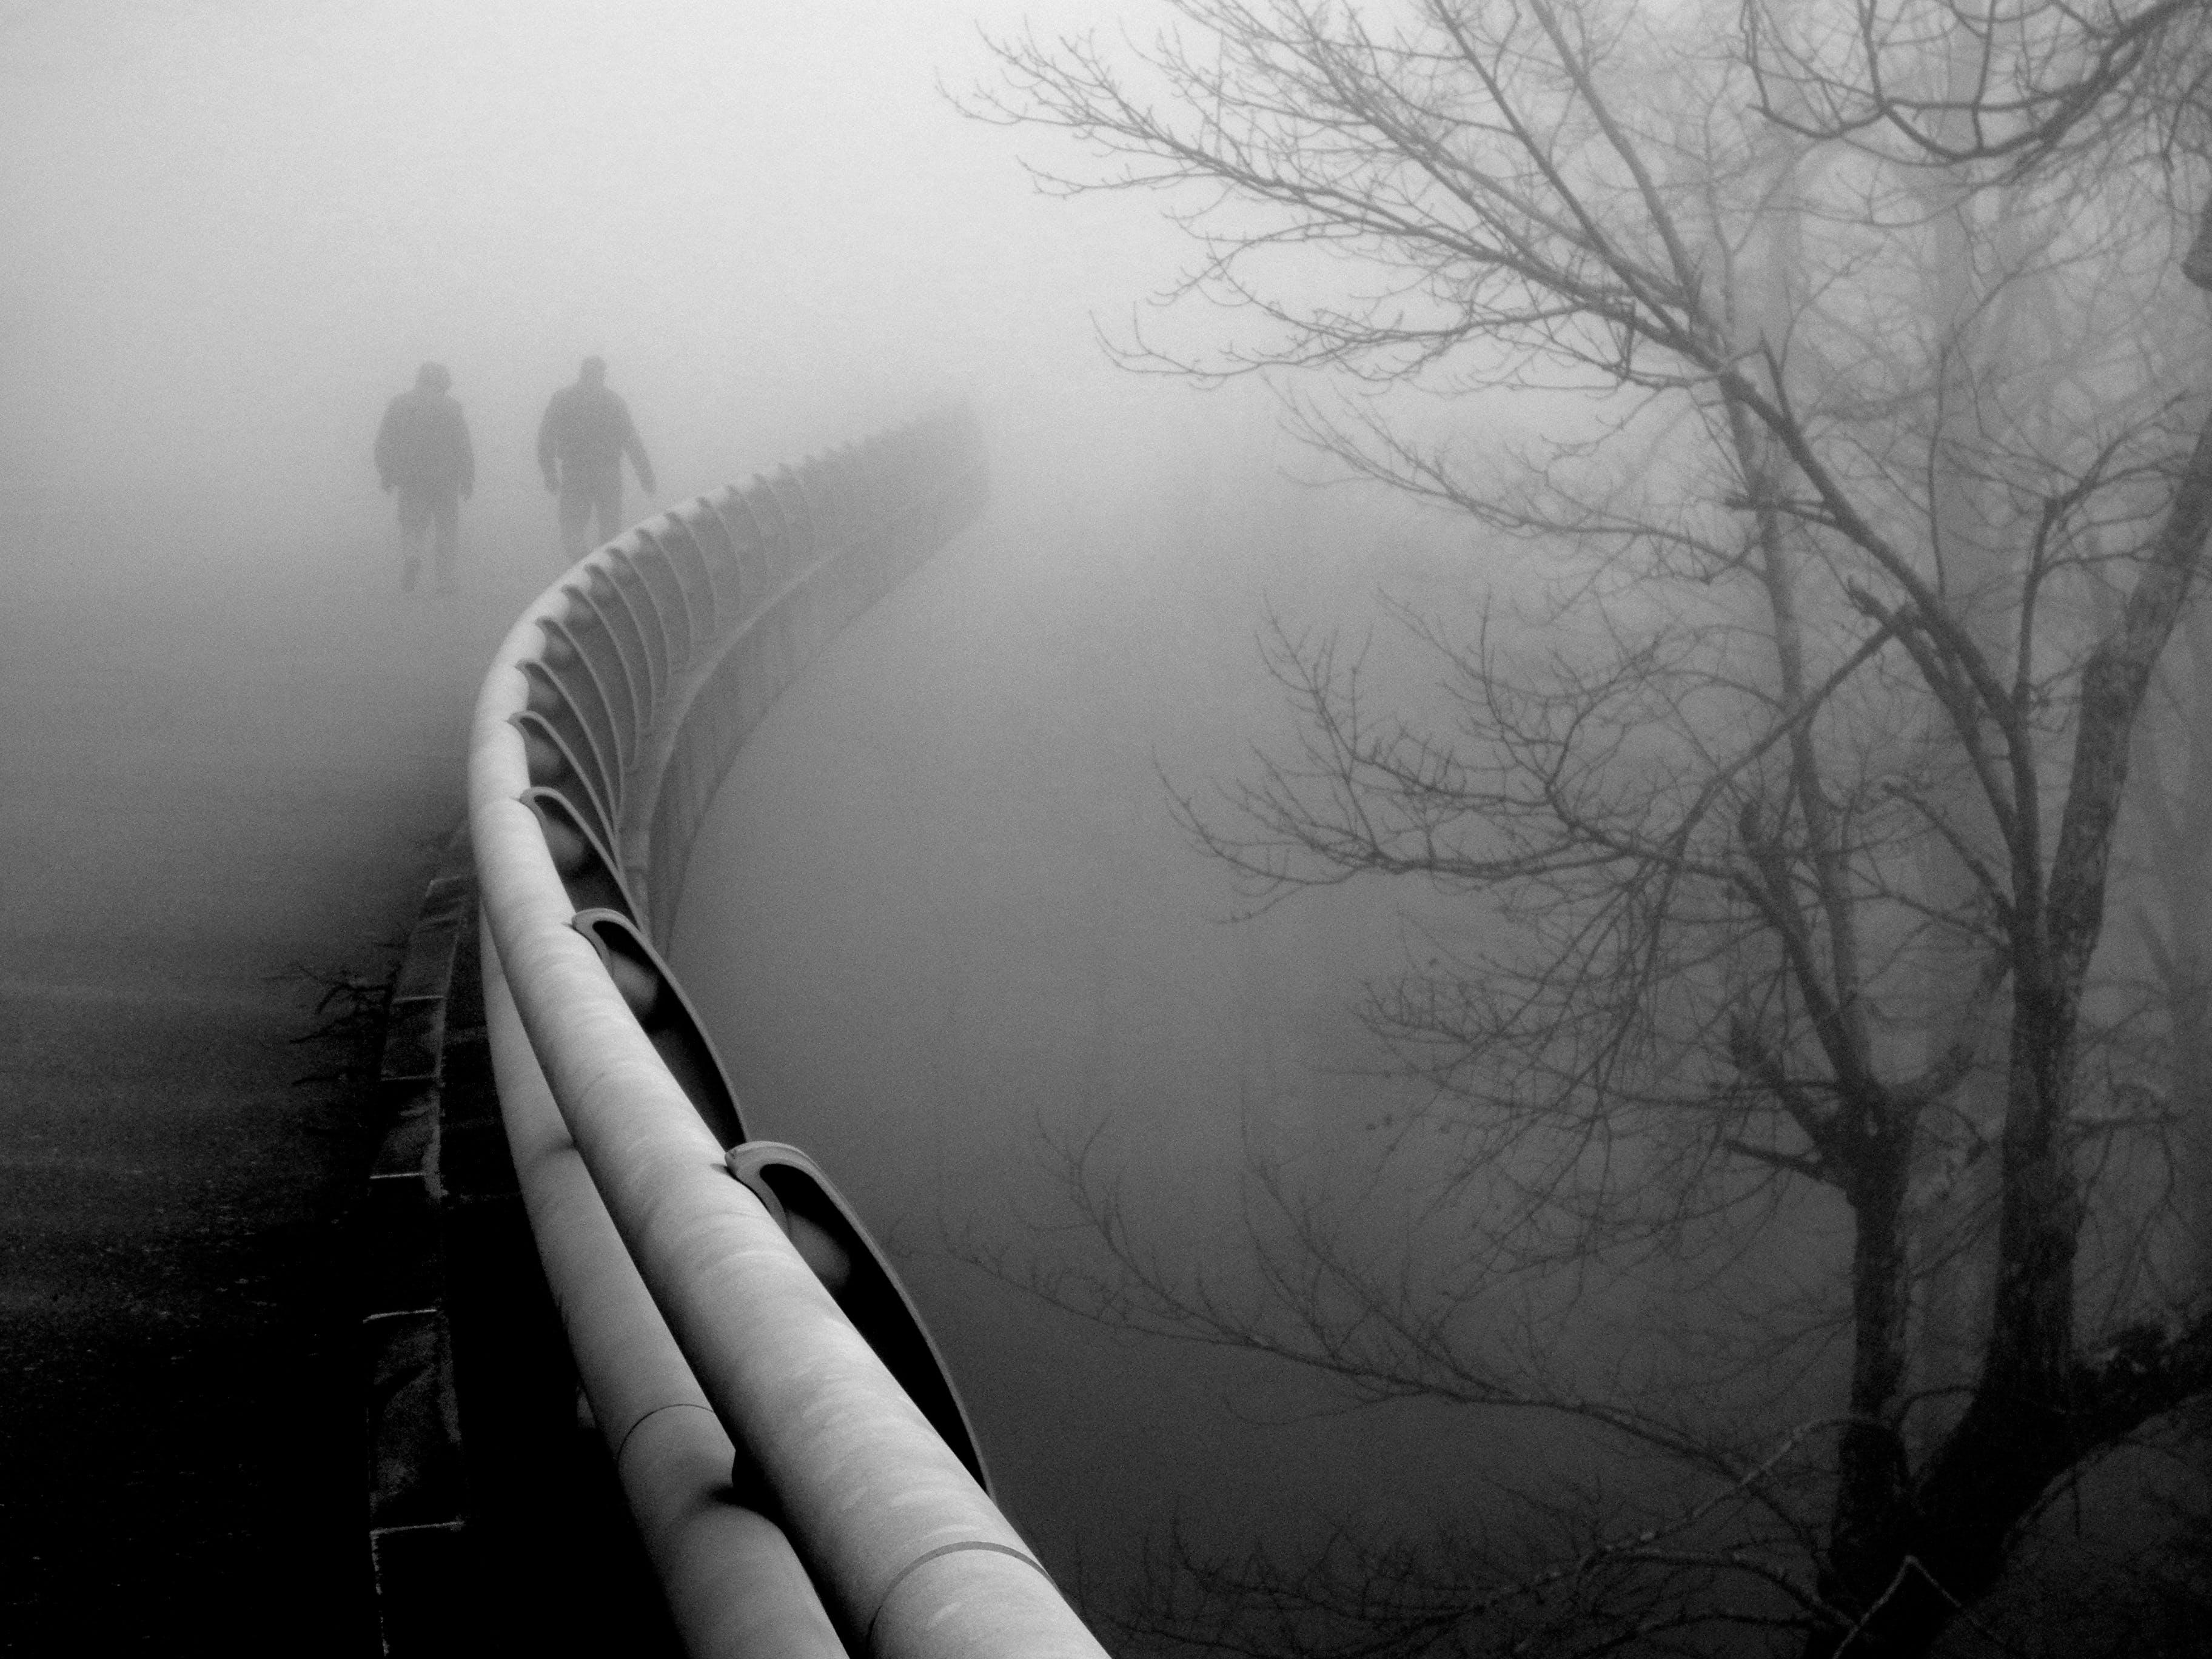 Free stock photo of Linn Cove Viaduct